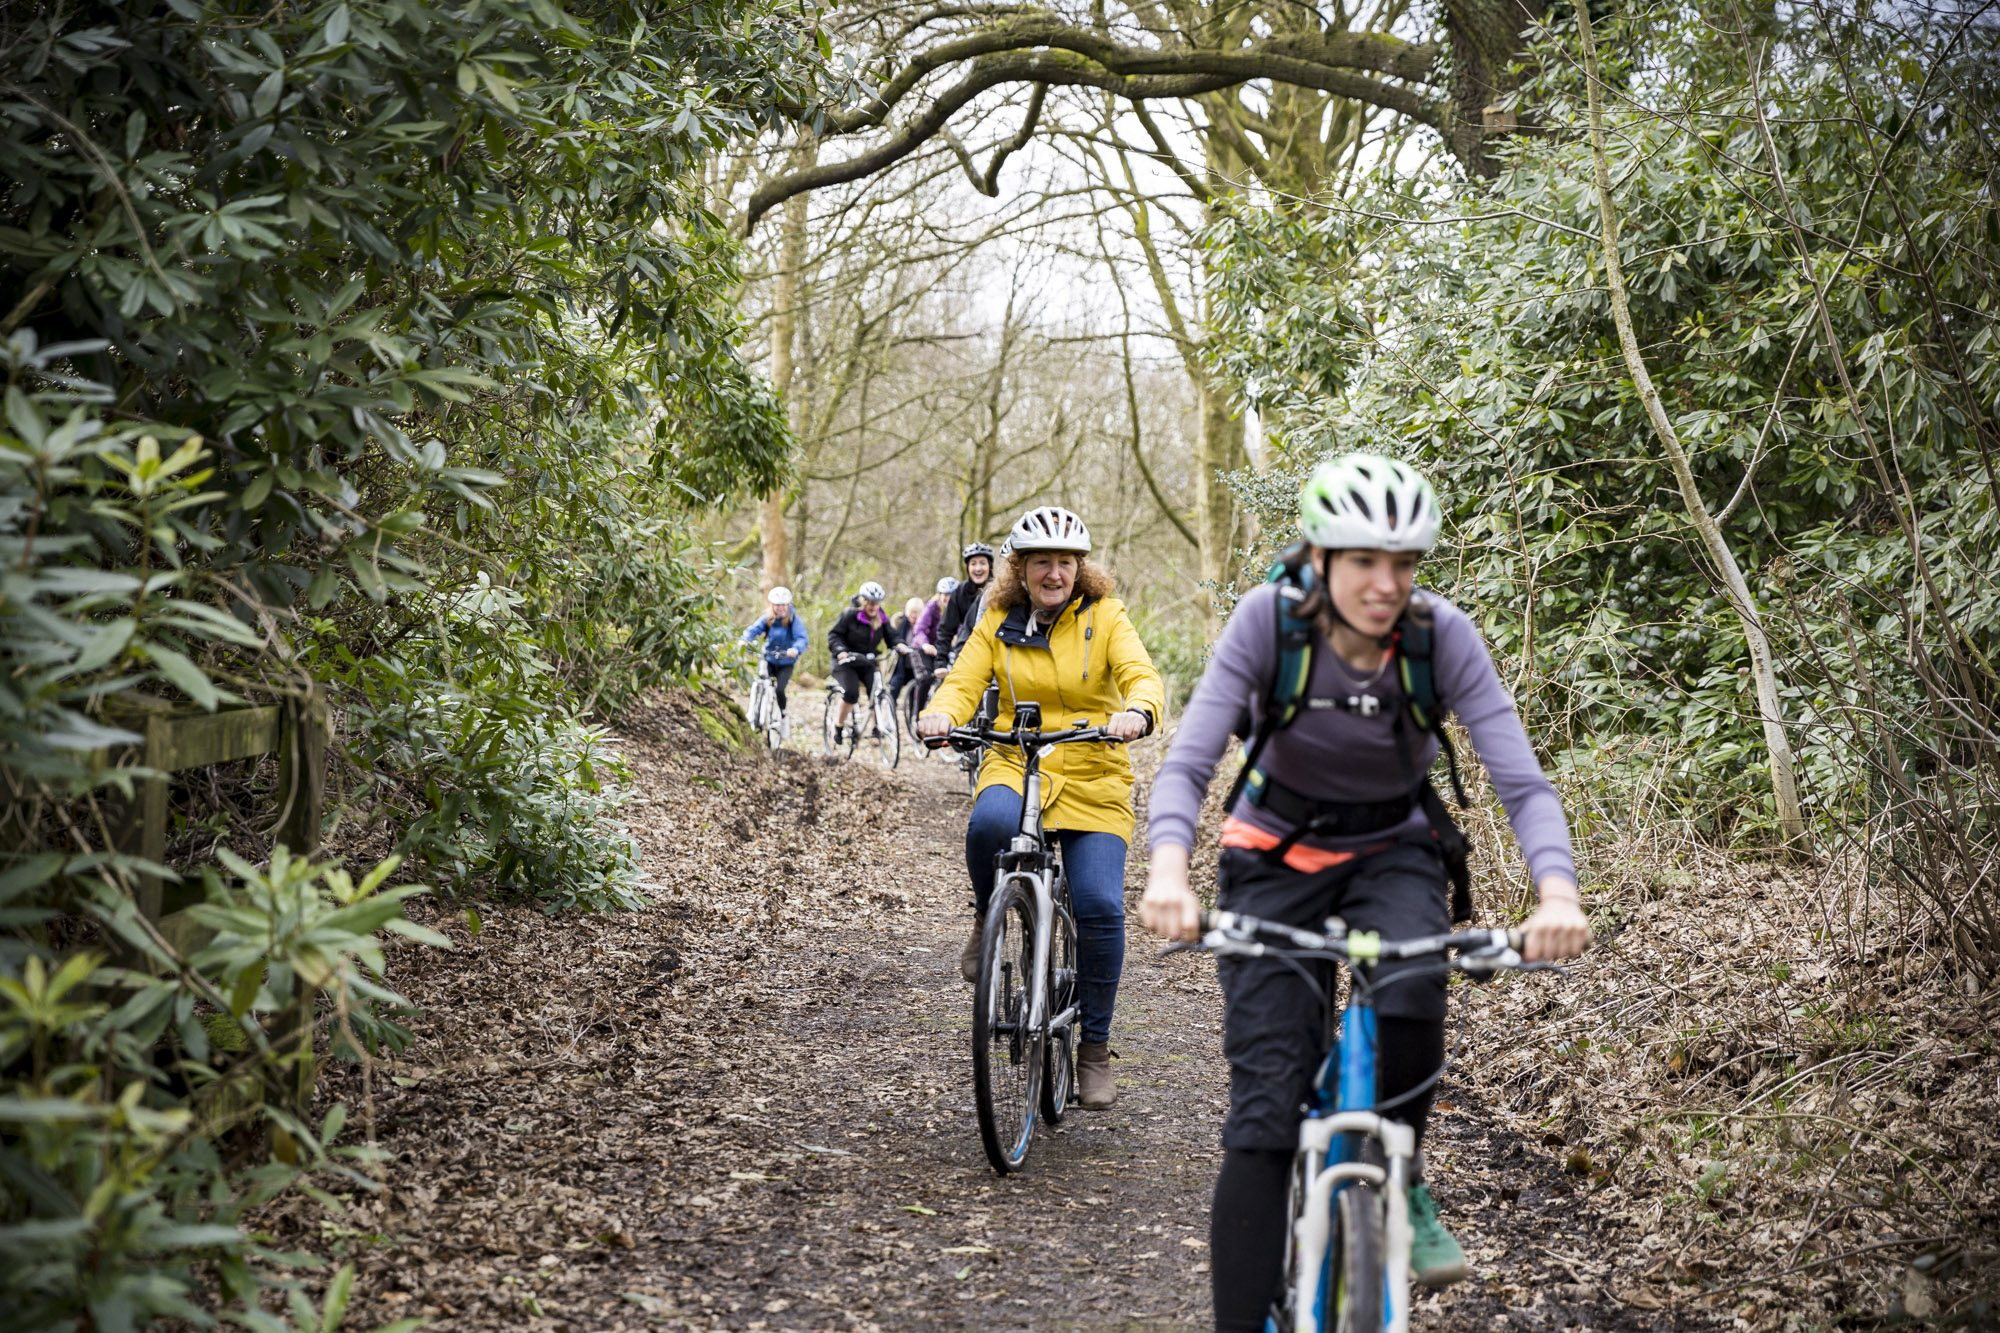 MAD about cycling - MAD Bike Club, via NCA GB, Bury/Manchester